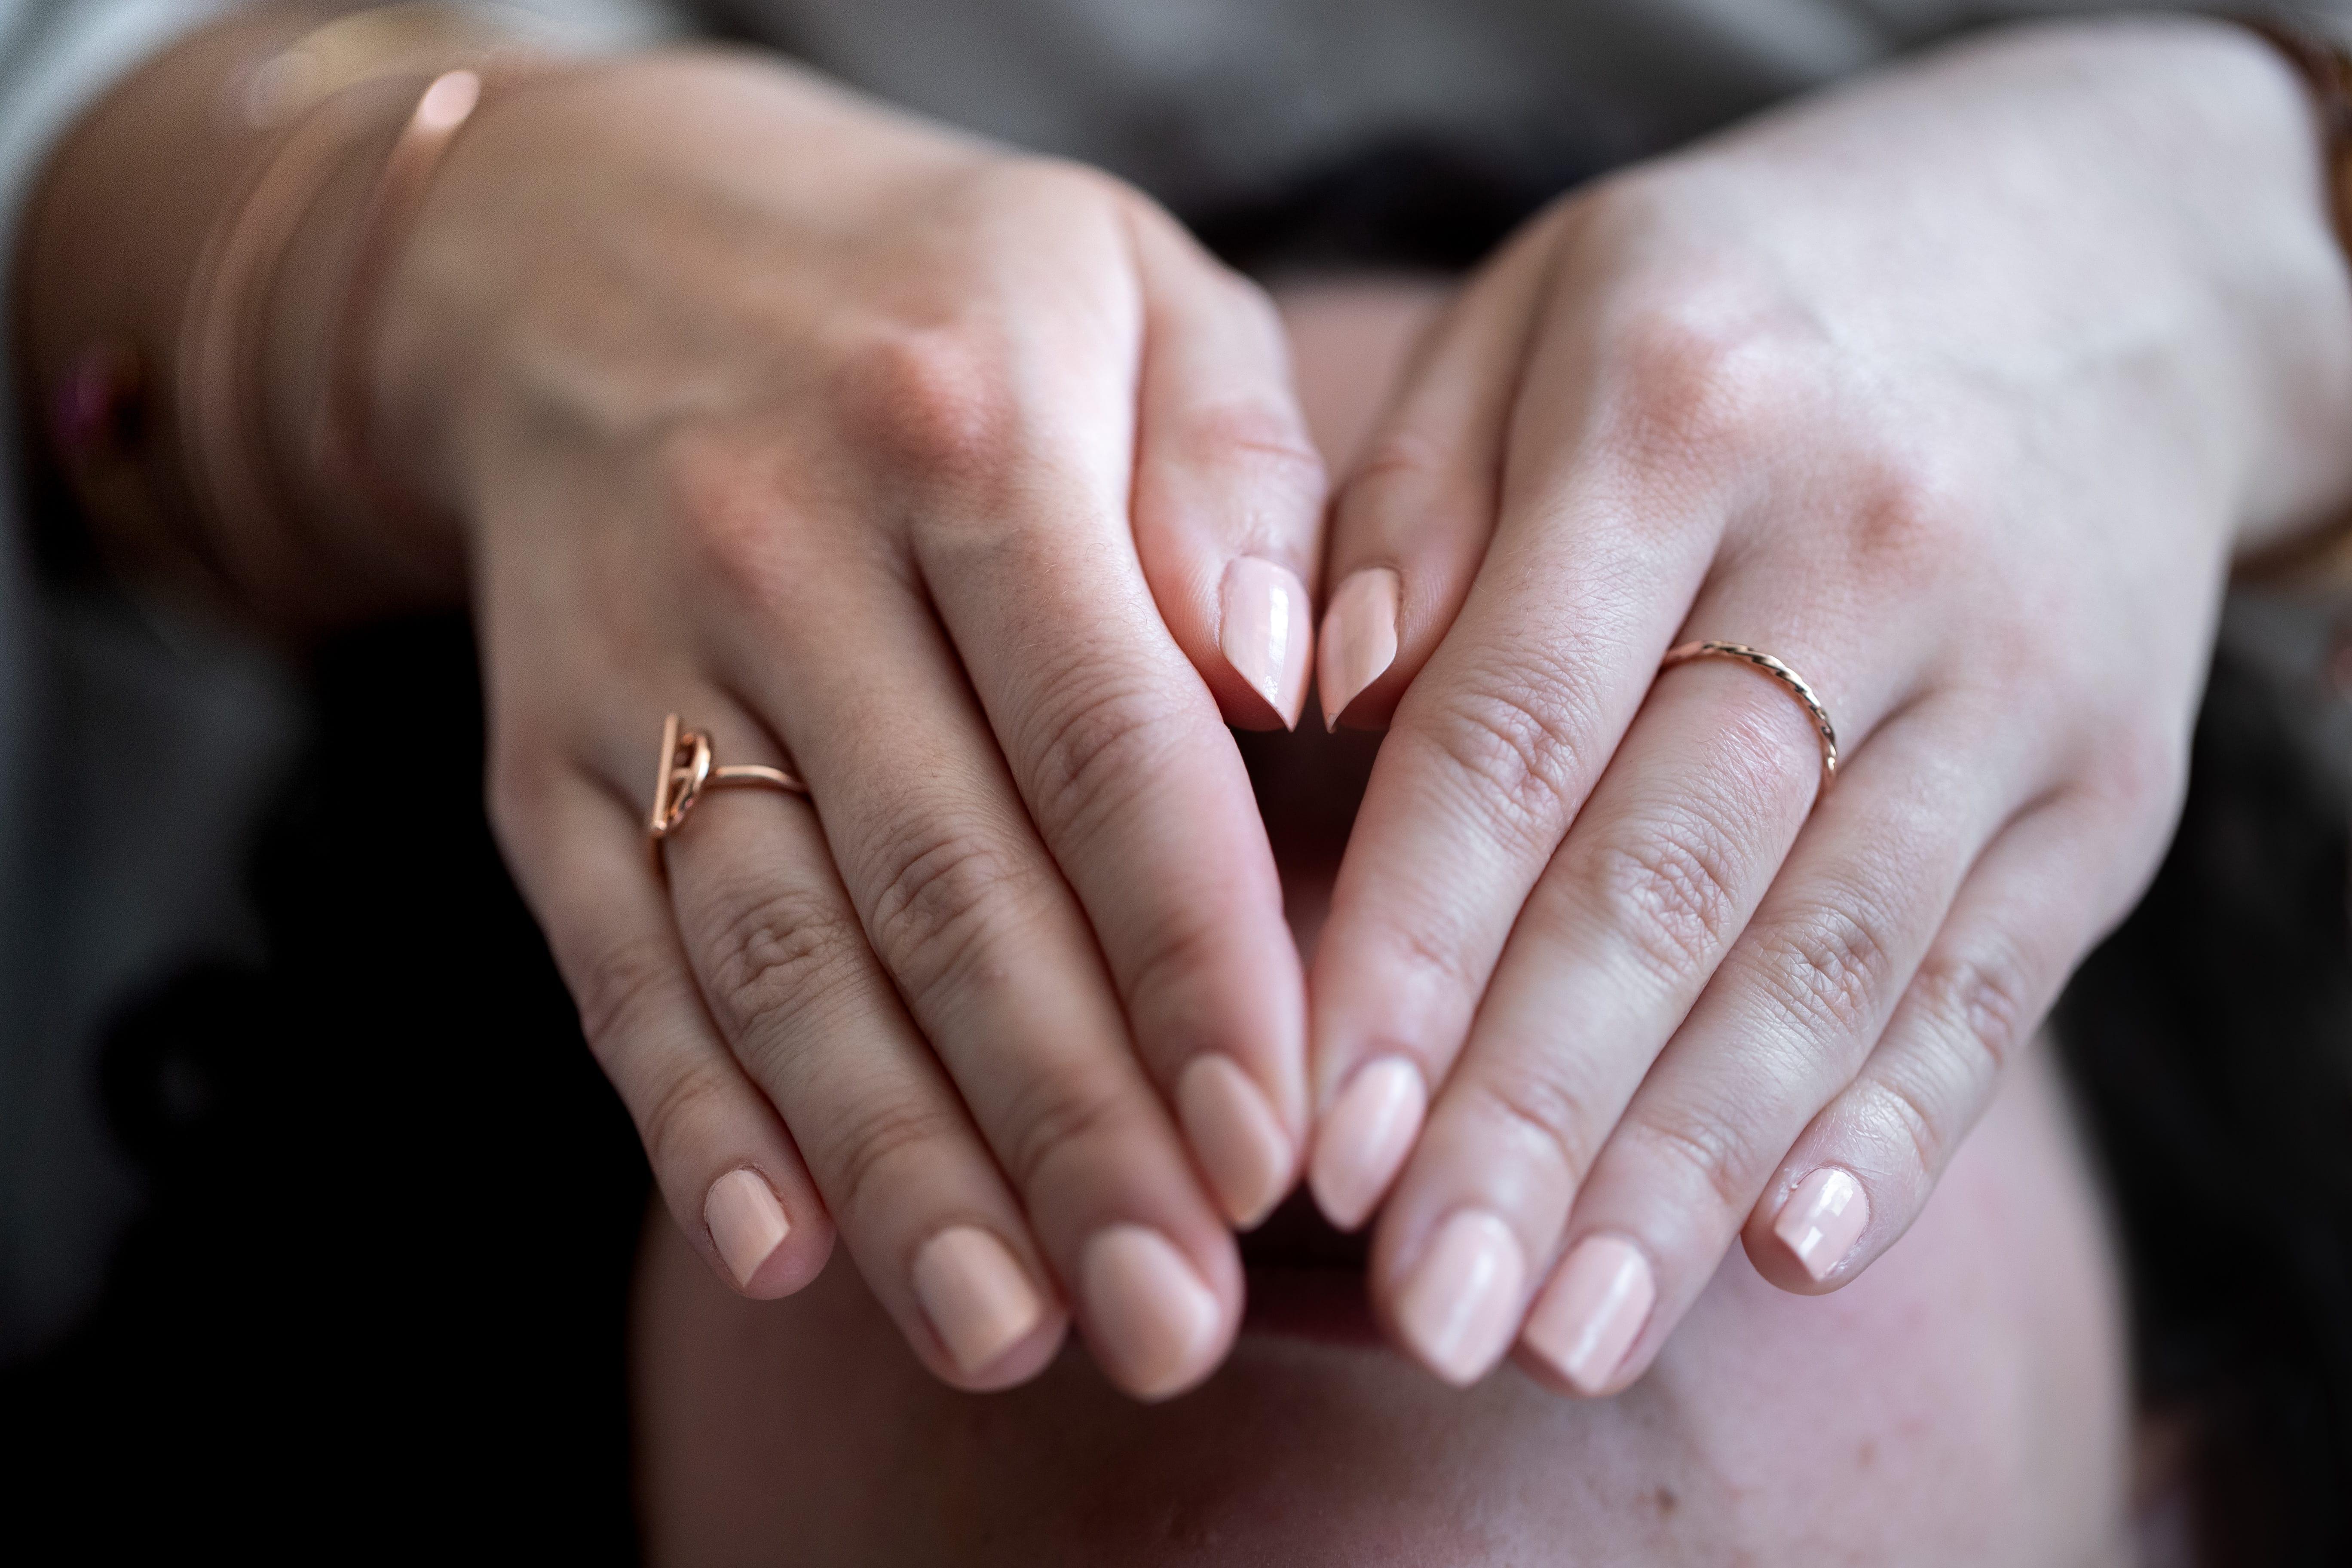 romy sousa mains